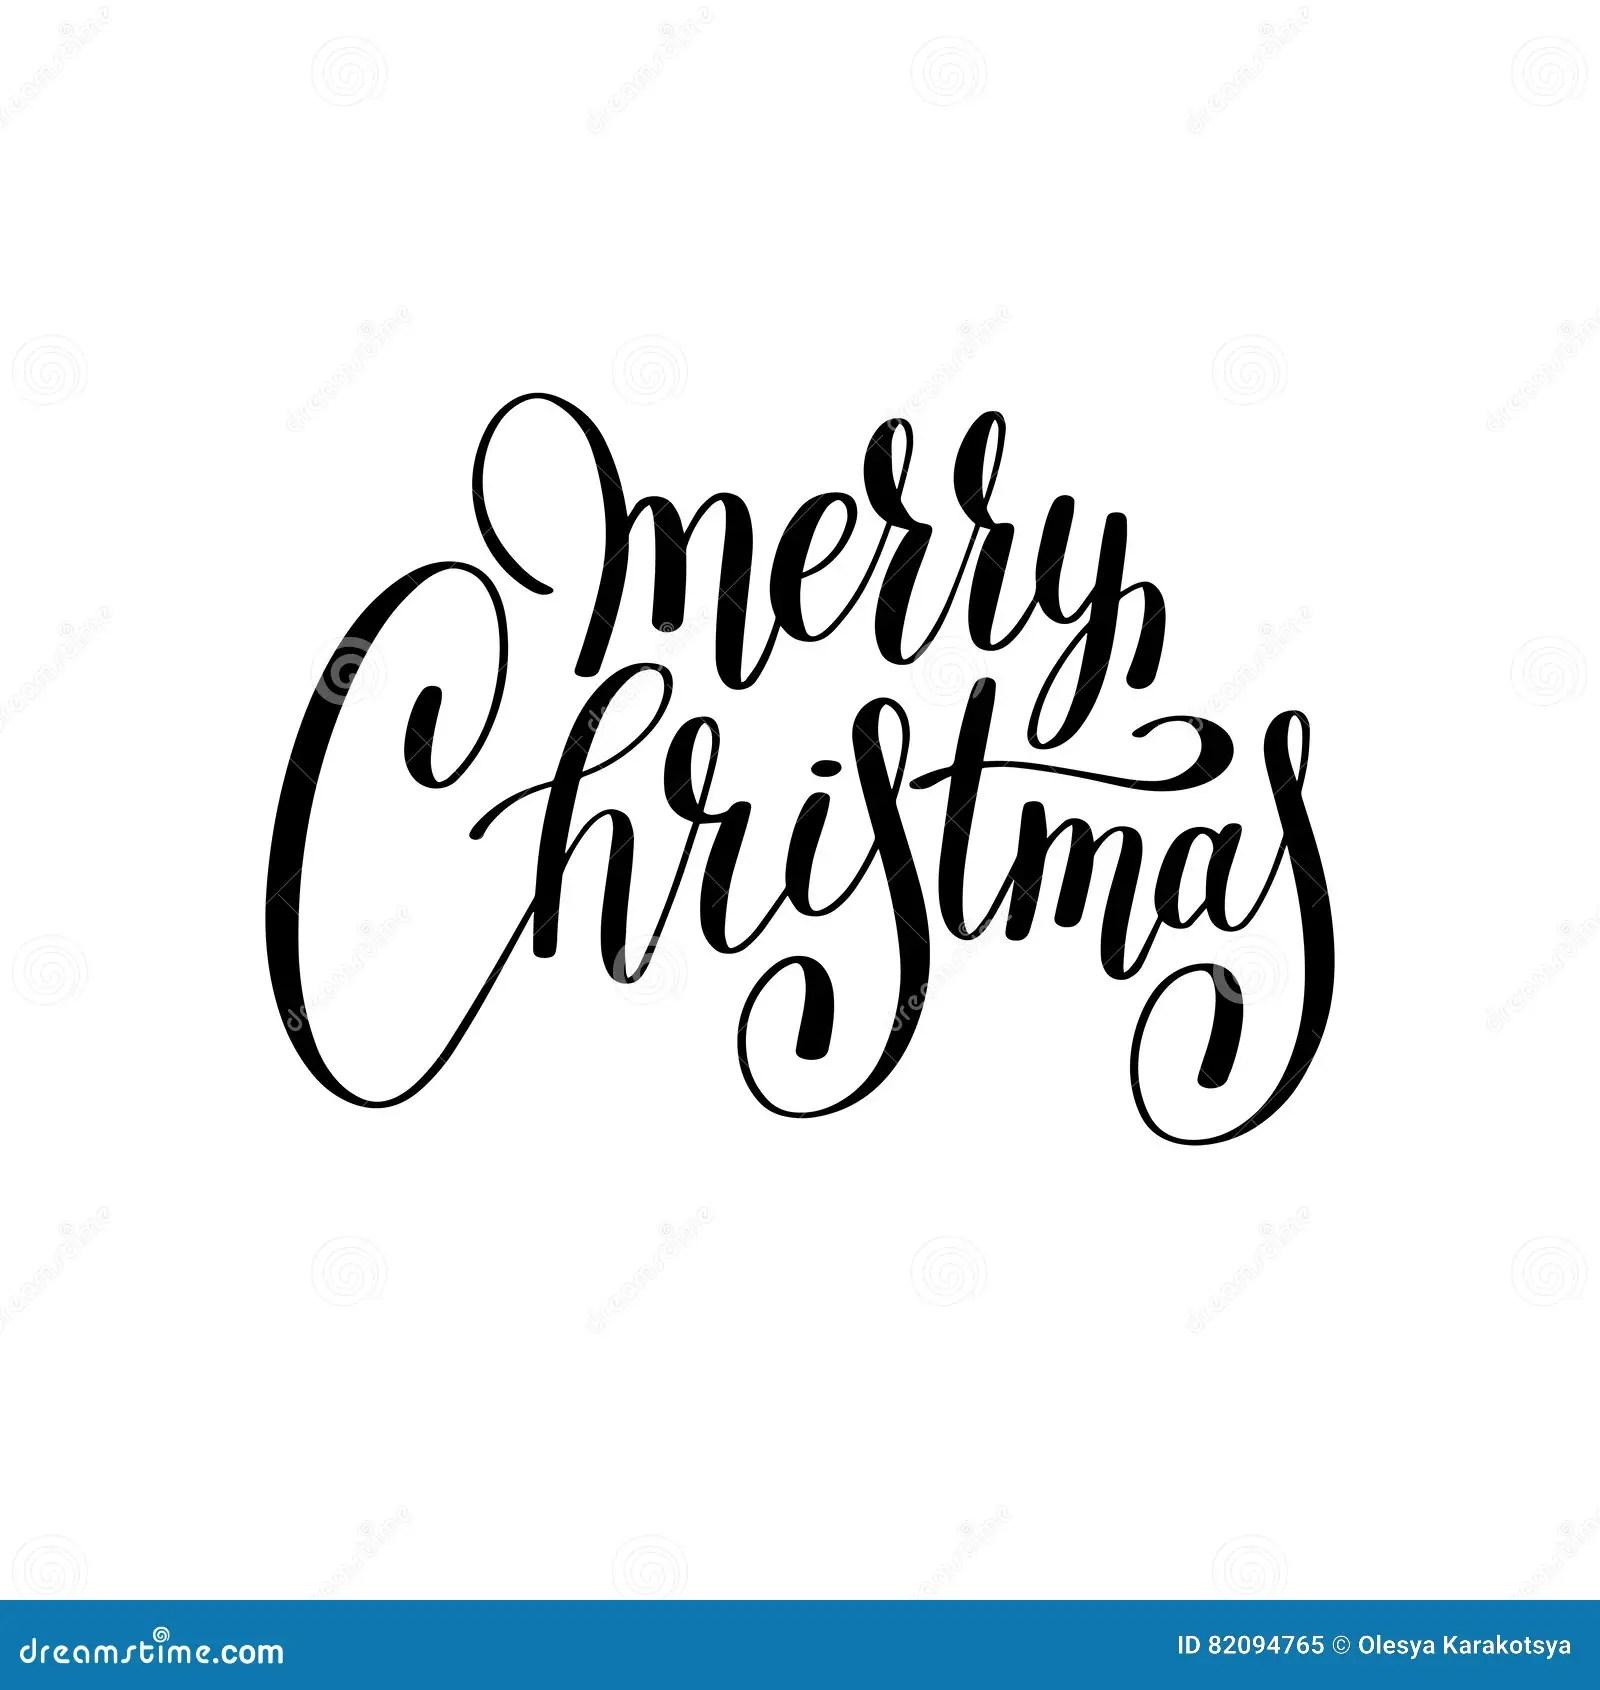 Merry Christmas Black And White Handwritten Lettering